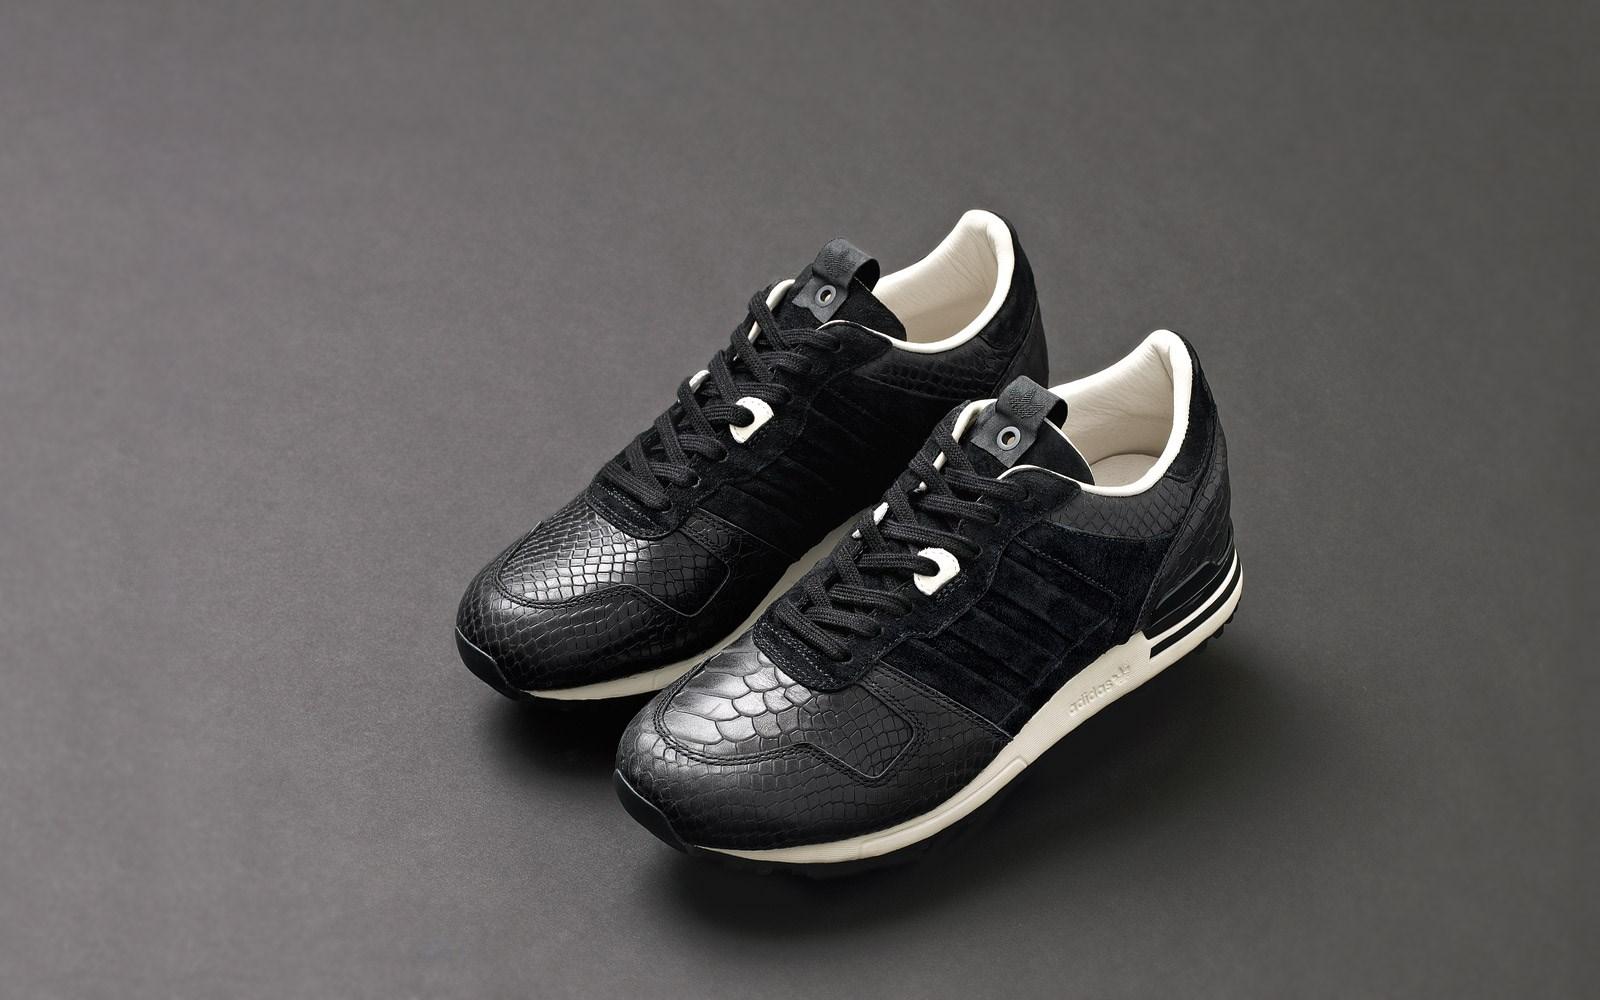 Adidas Zx 700 Wmns G64374 Scarpe da Ginnasticanstuff Scarpe & Streetwear